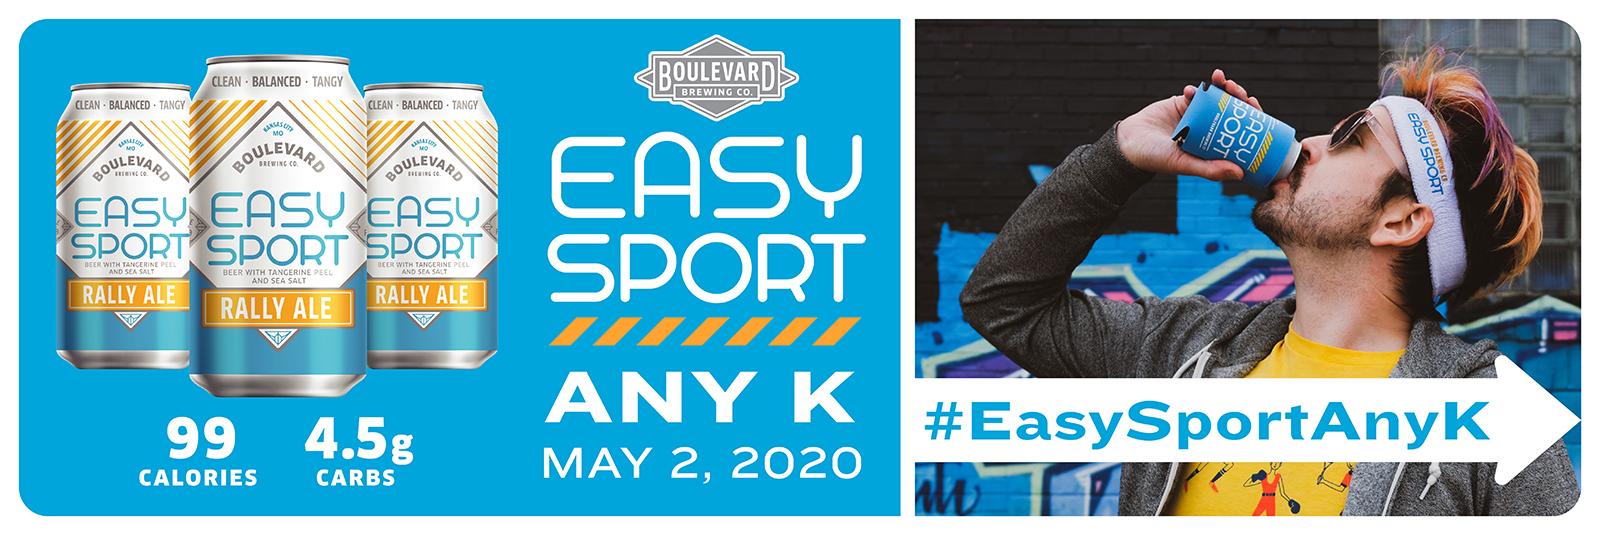 Easy Sport AnyK | Boulevard Brewing Company